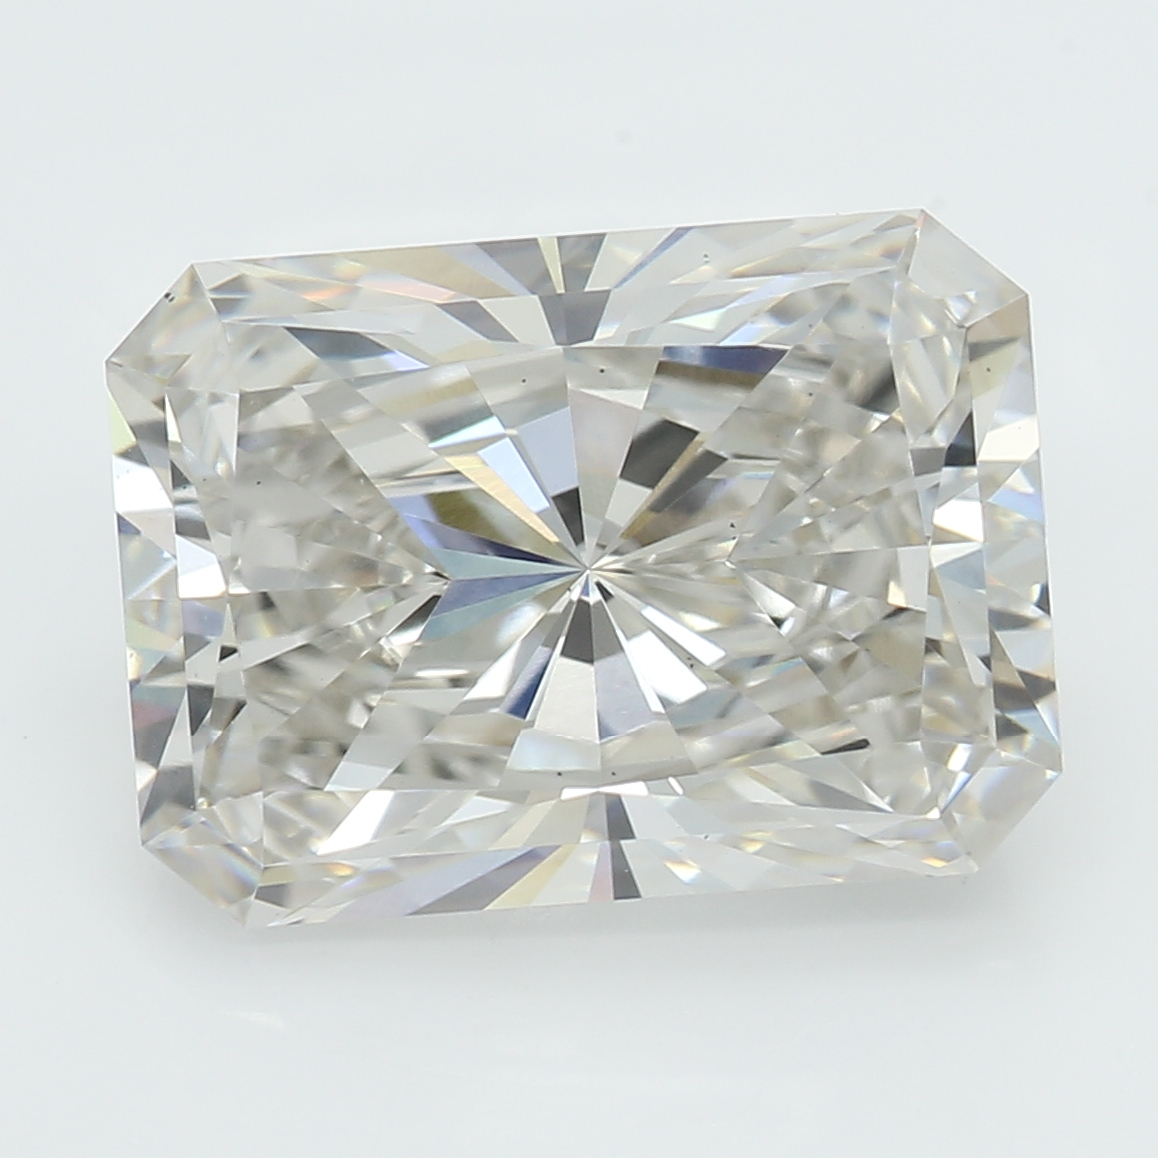 3.31 Carat I-VS1 Ideal Radiant Diamond